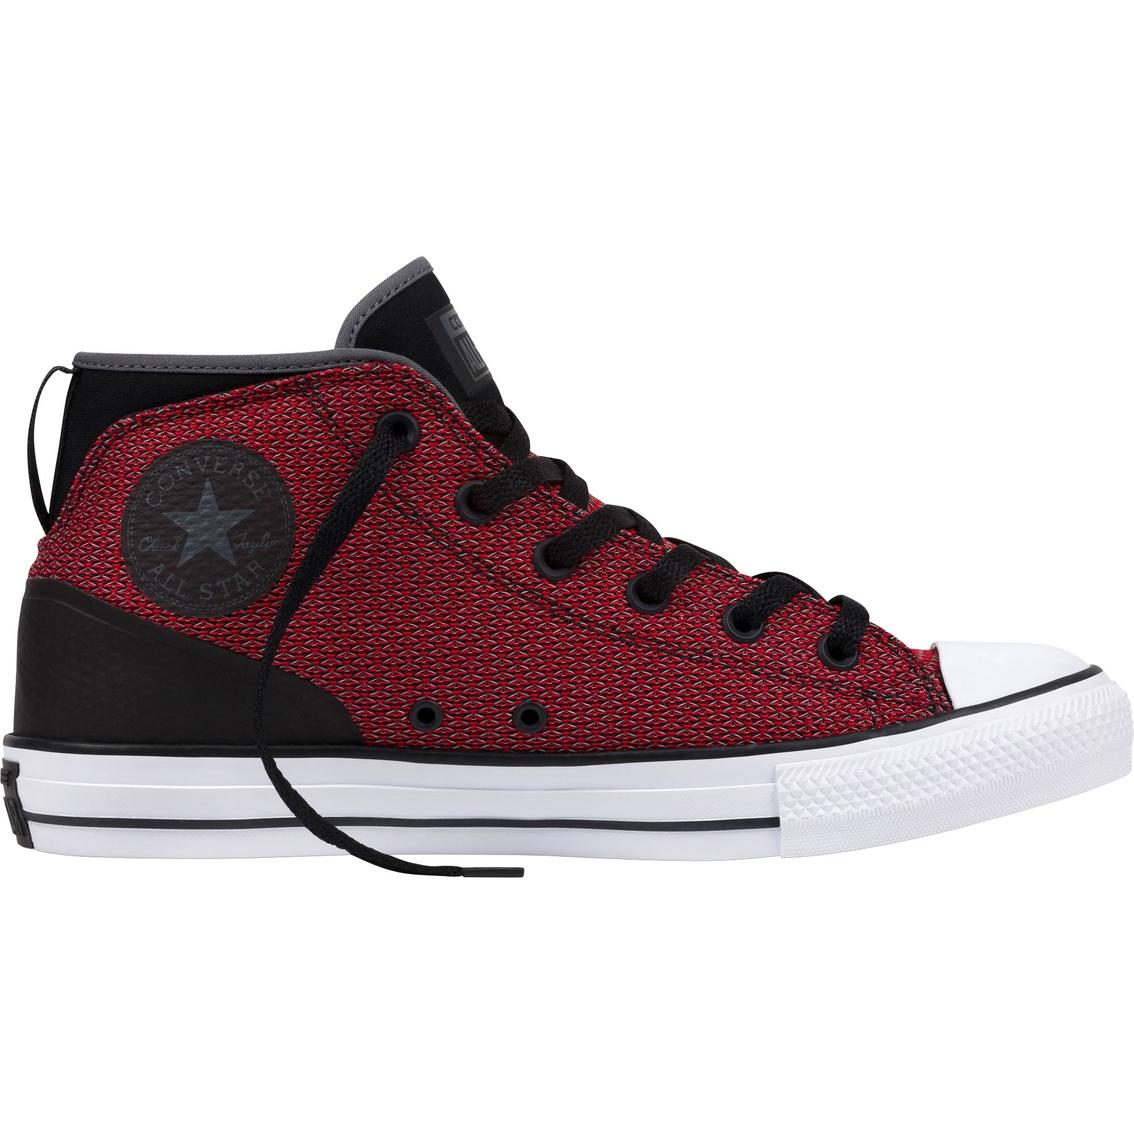 9bba631028da Converse Men s Chuck Taylor All Star Syde Street Mid Shoes ...